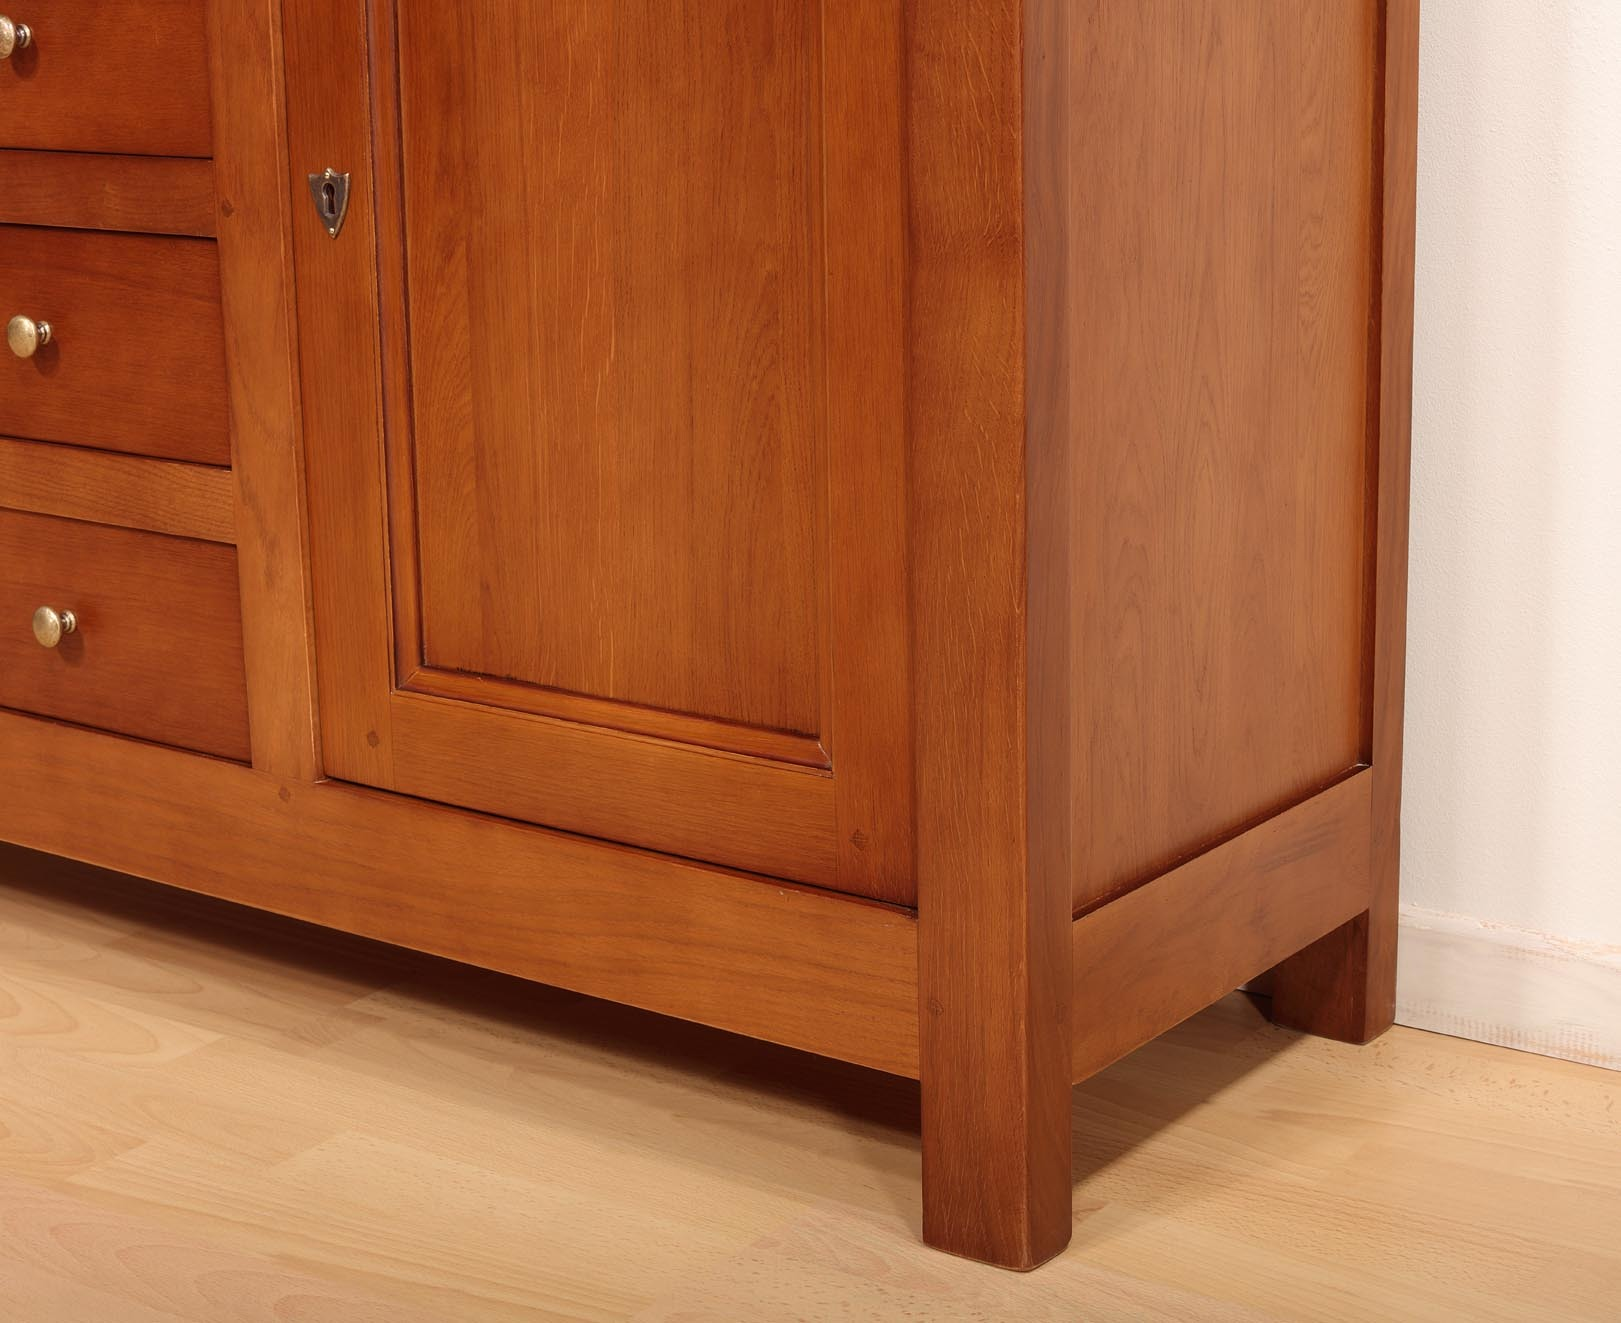 petit buffet 2 portes 7 tiroirs en ch ne massif de style campagnard meuble en ch ne. Black Bedroom Furniture Sets. Home Design Ideas